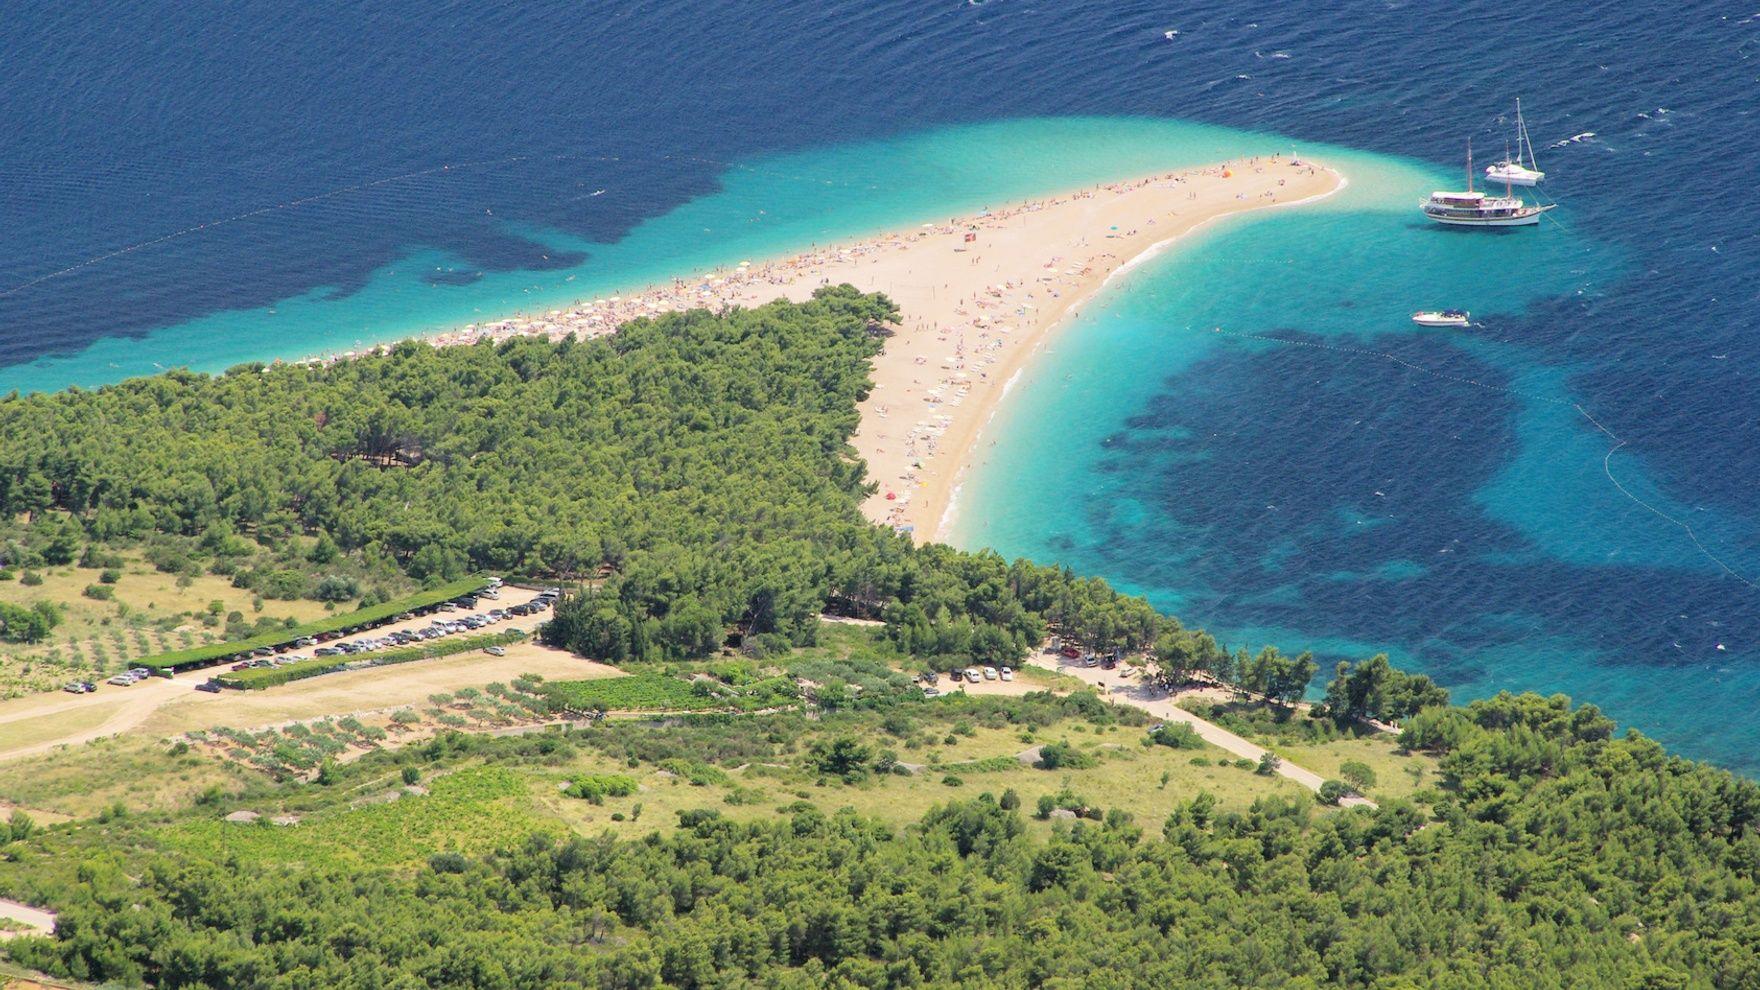 Яхтенный поход по Хорватии